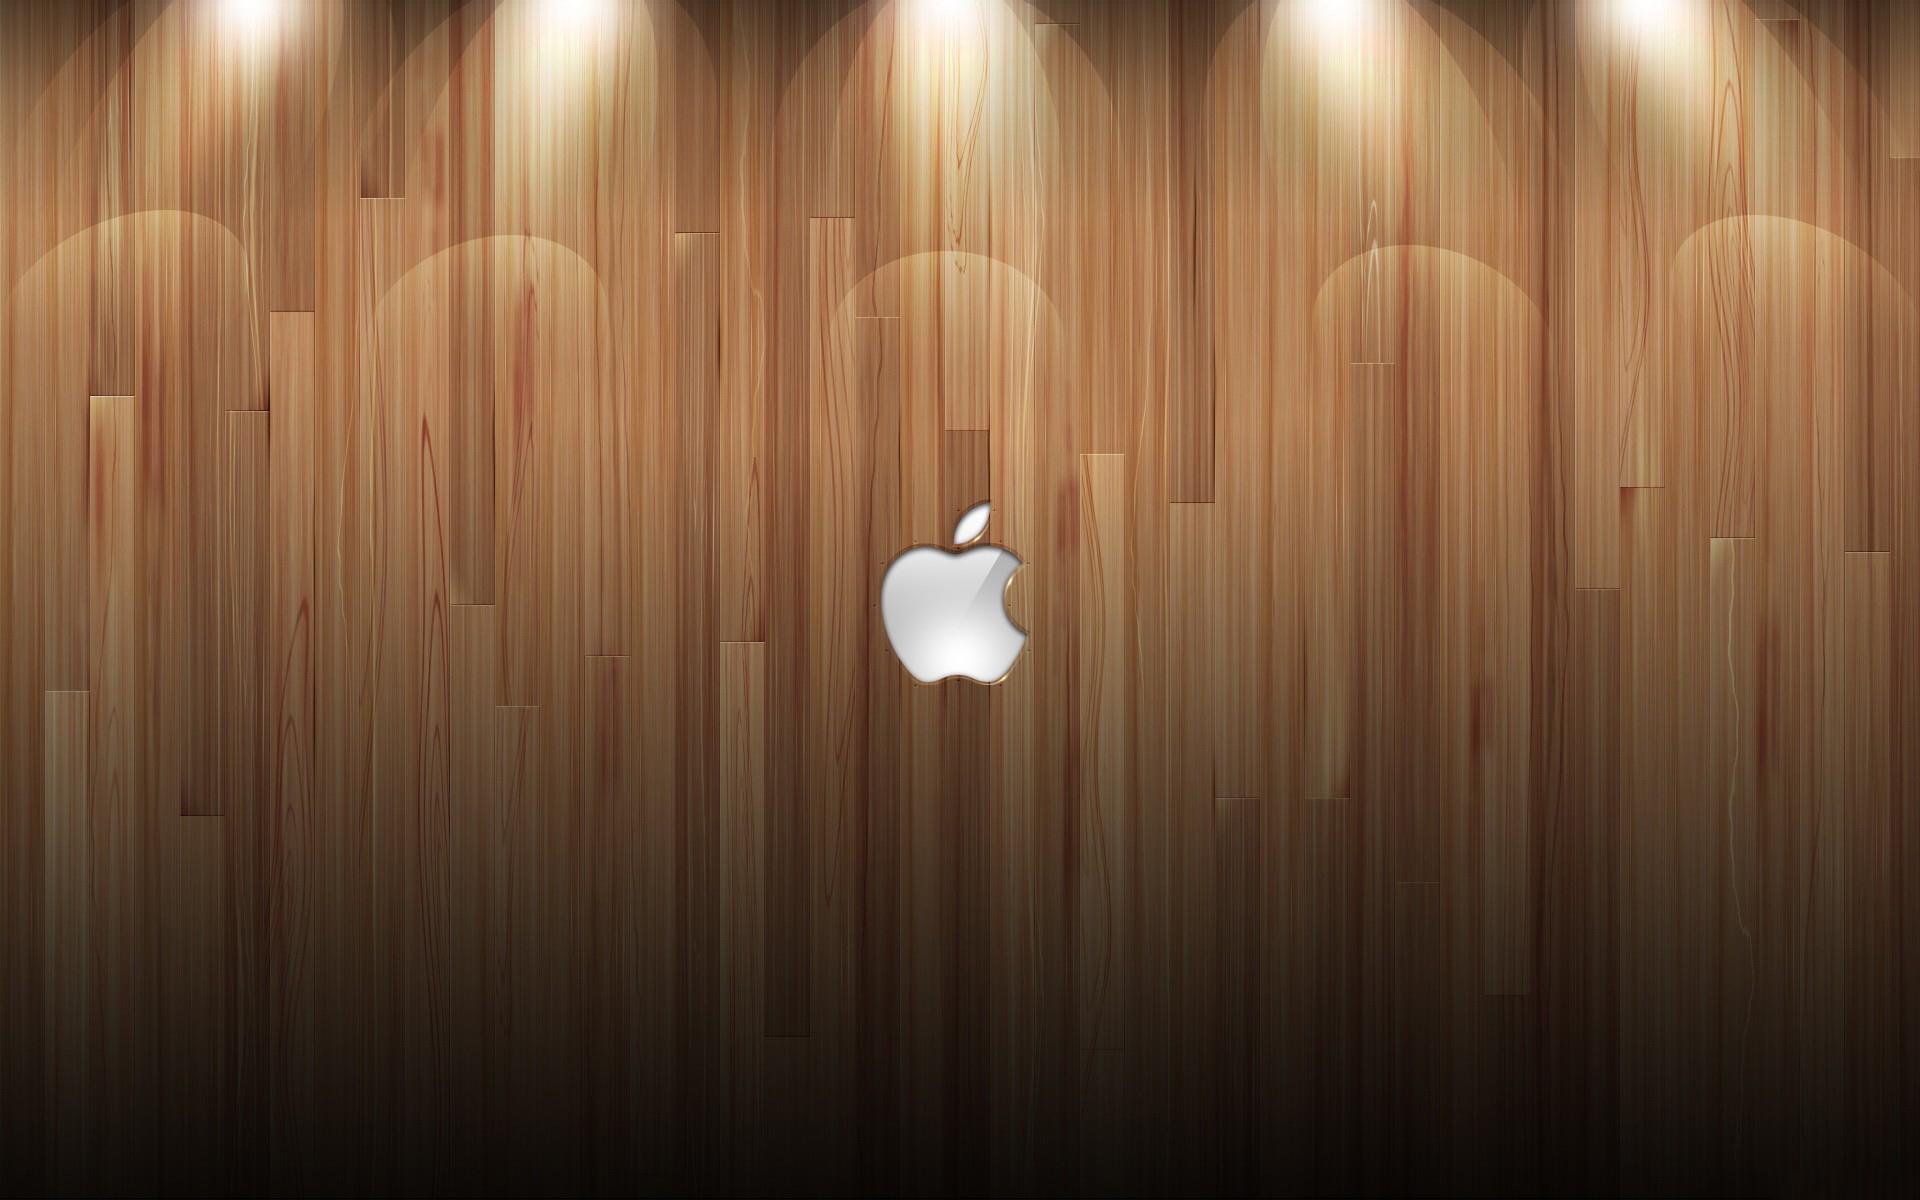 Apple Logo Wood Background Lights Desktop Wallpaper